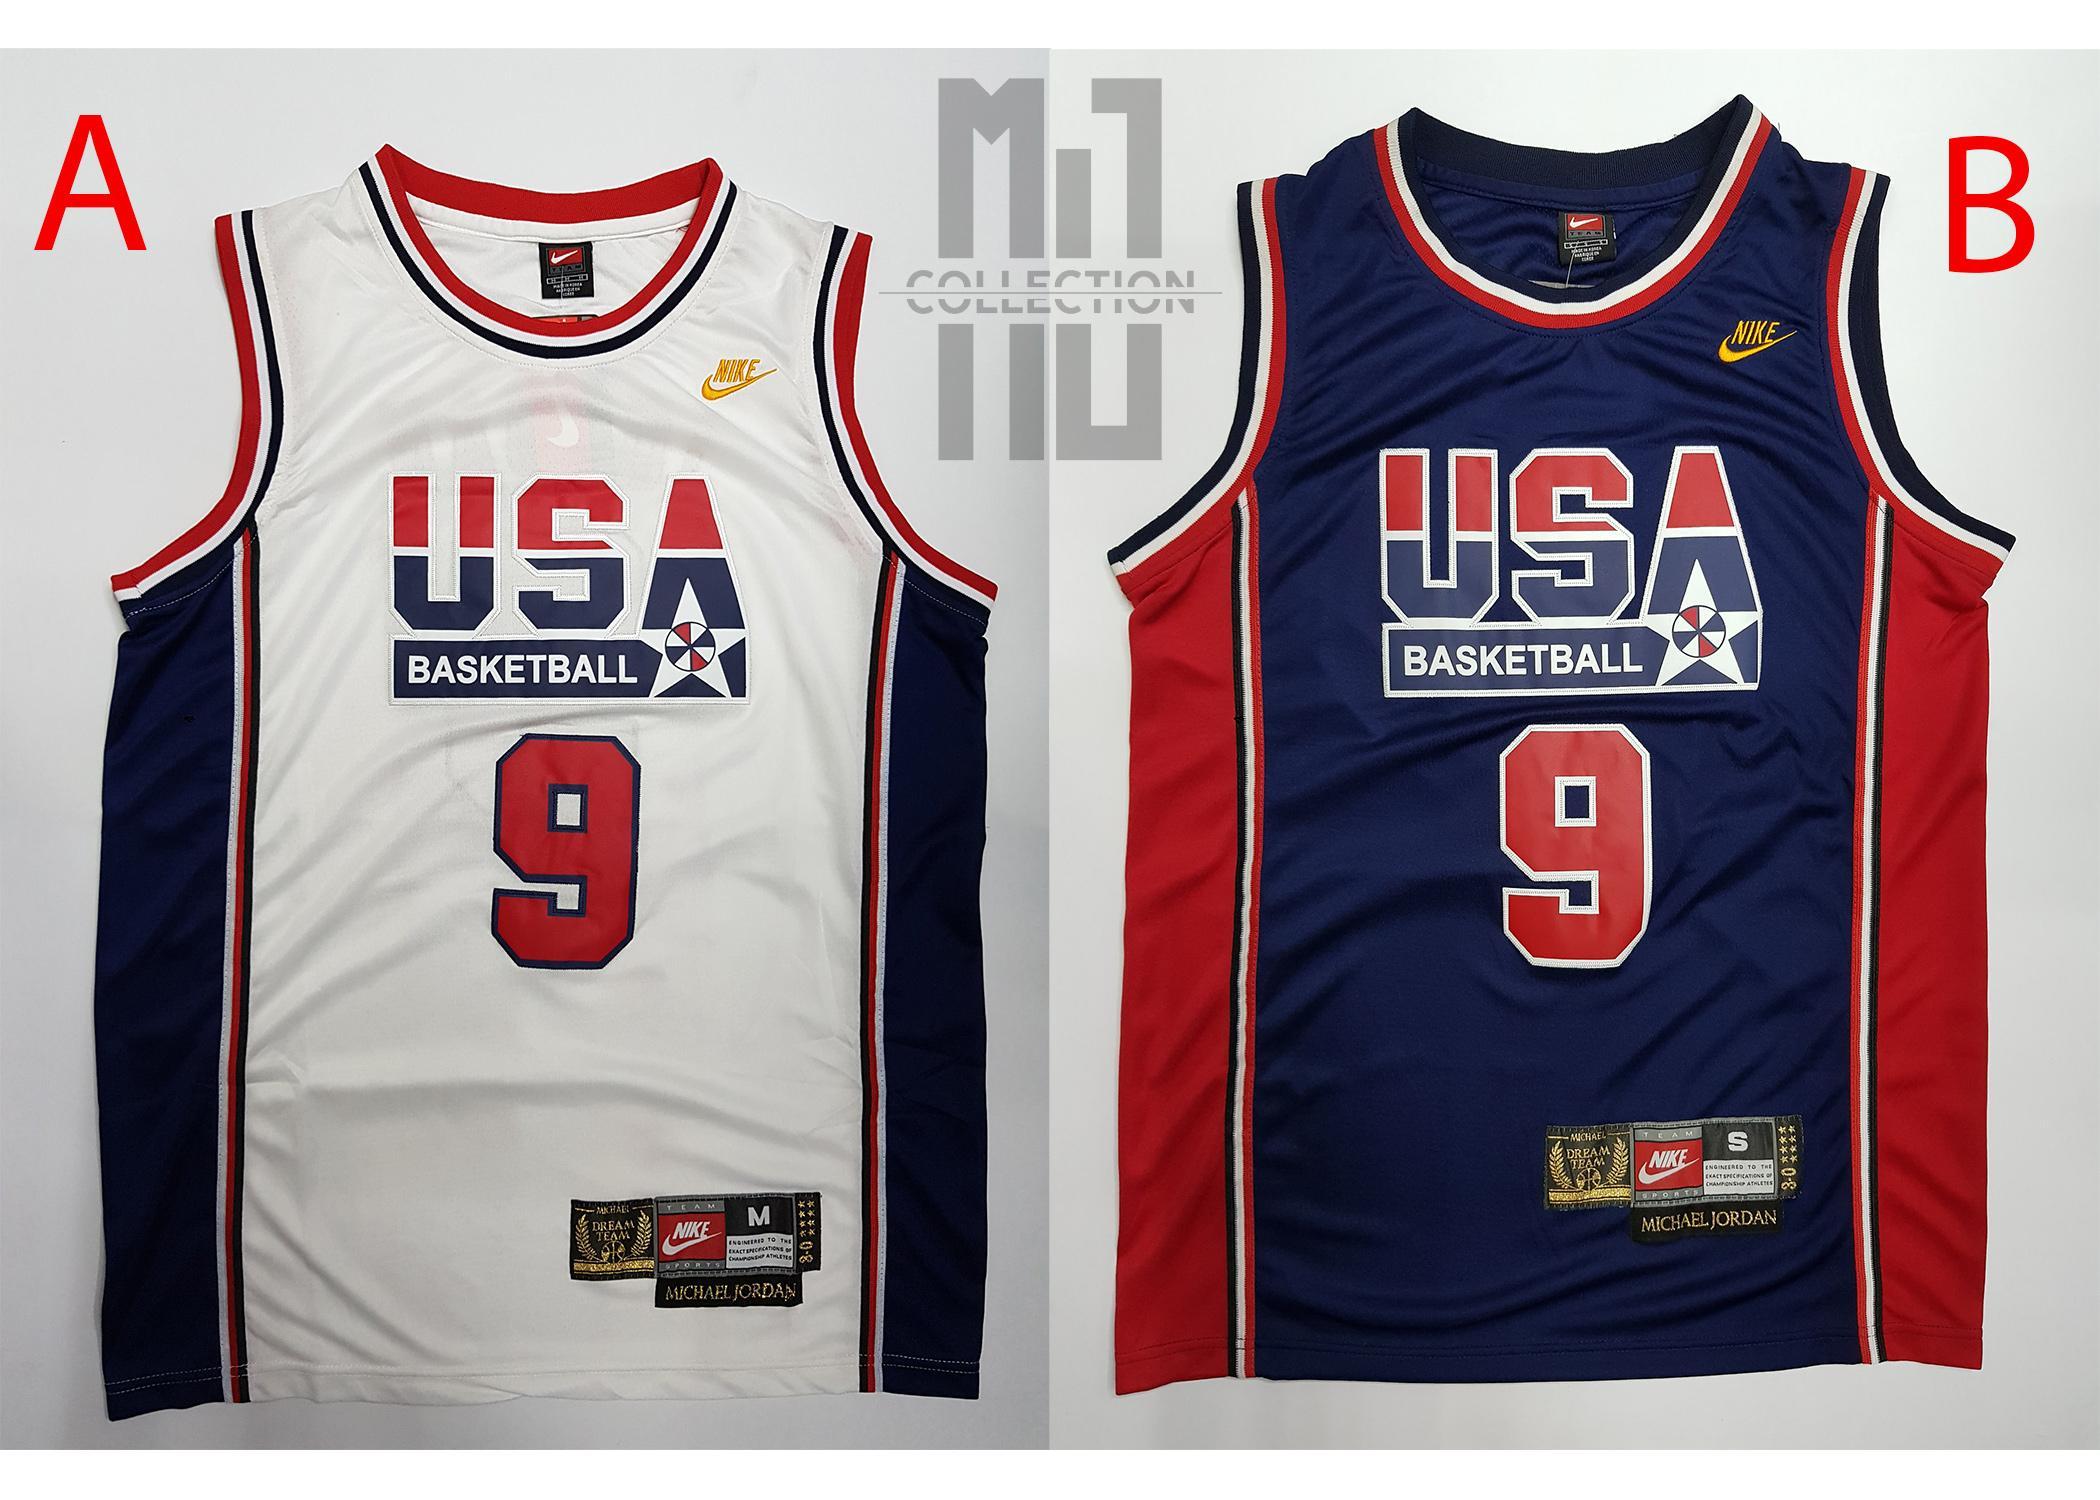 super popular d6ceb 65280 Michael Jordan USA Jersey - NBA Basketball Jersey